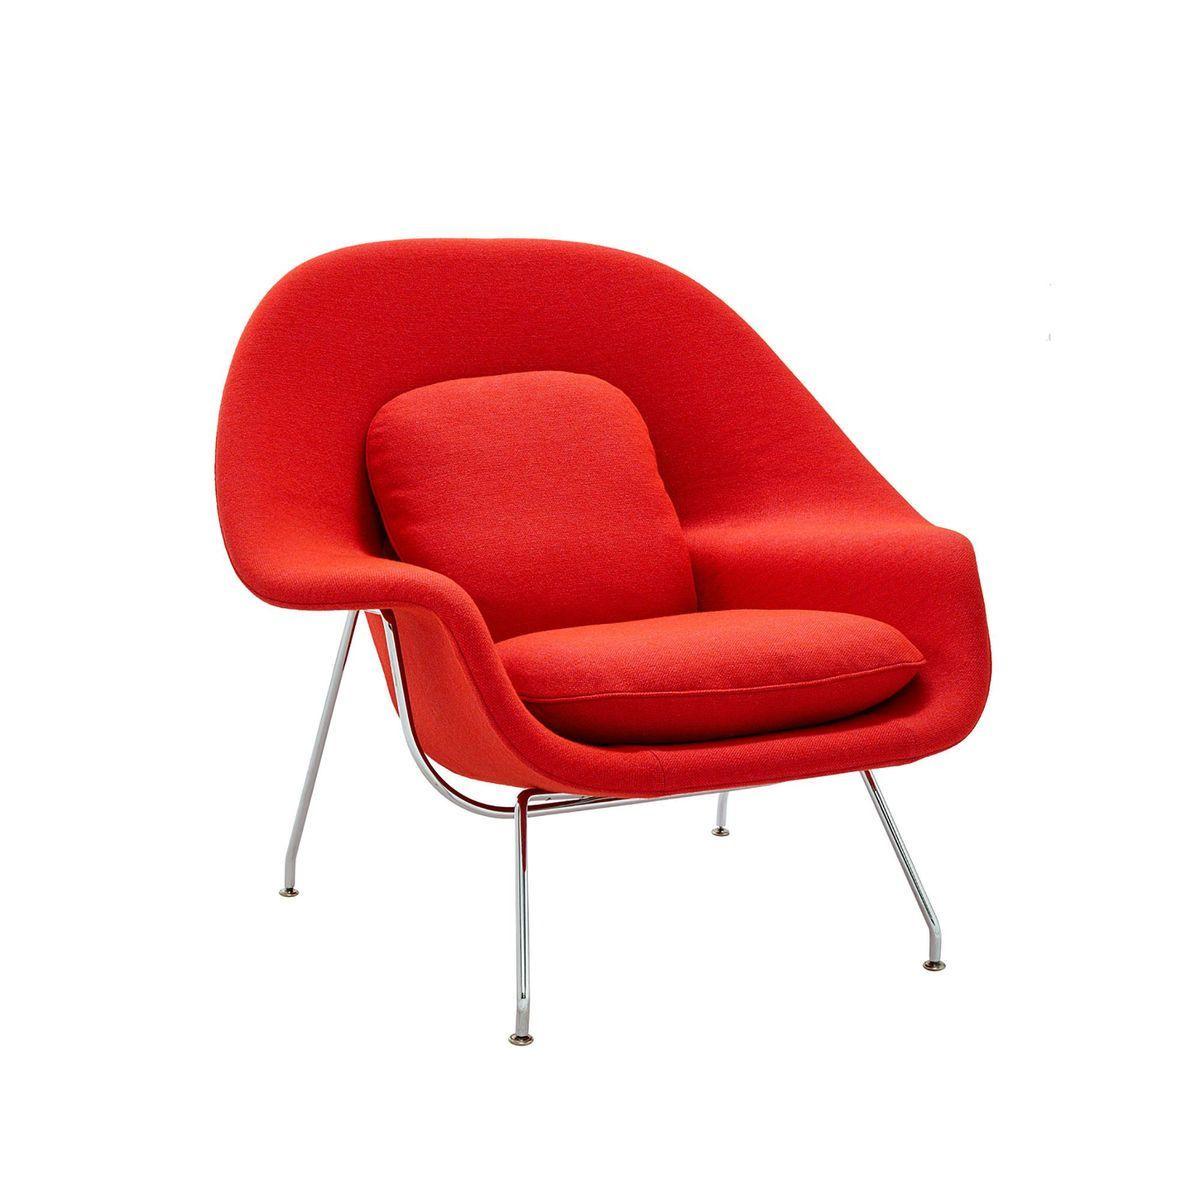 Knoll womb chair - Knoll International Womb Chair Relax Frame Chrome Fuchsia Red Fabric Hallingdal Fuchsia Red